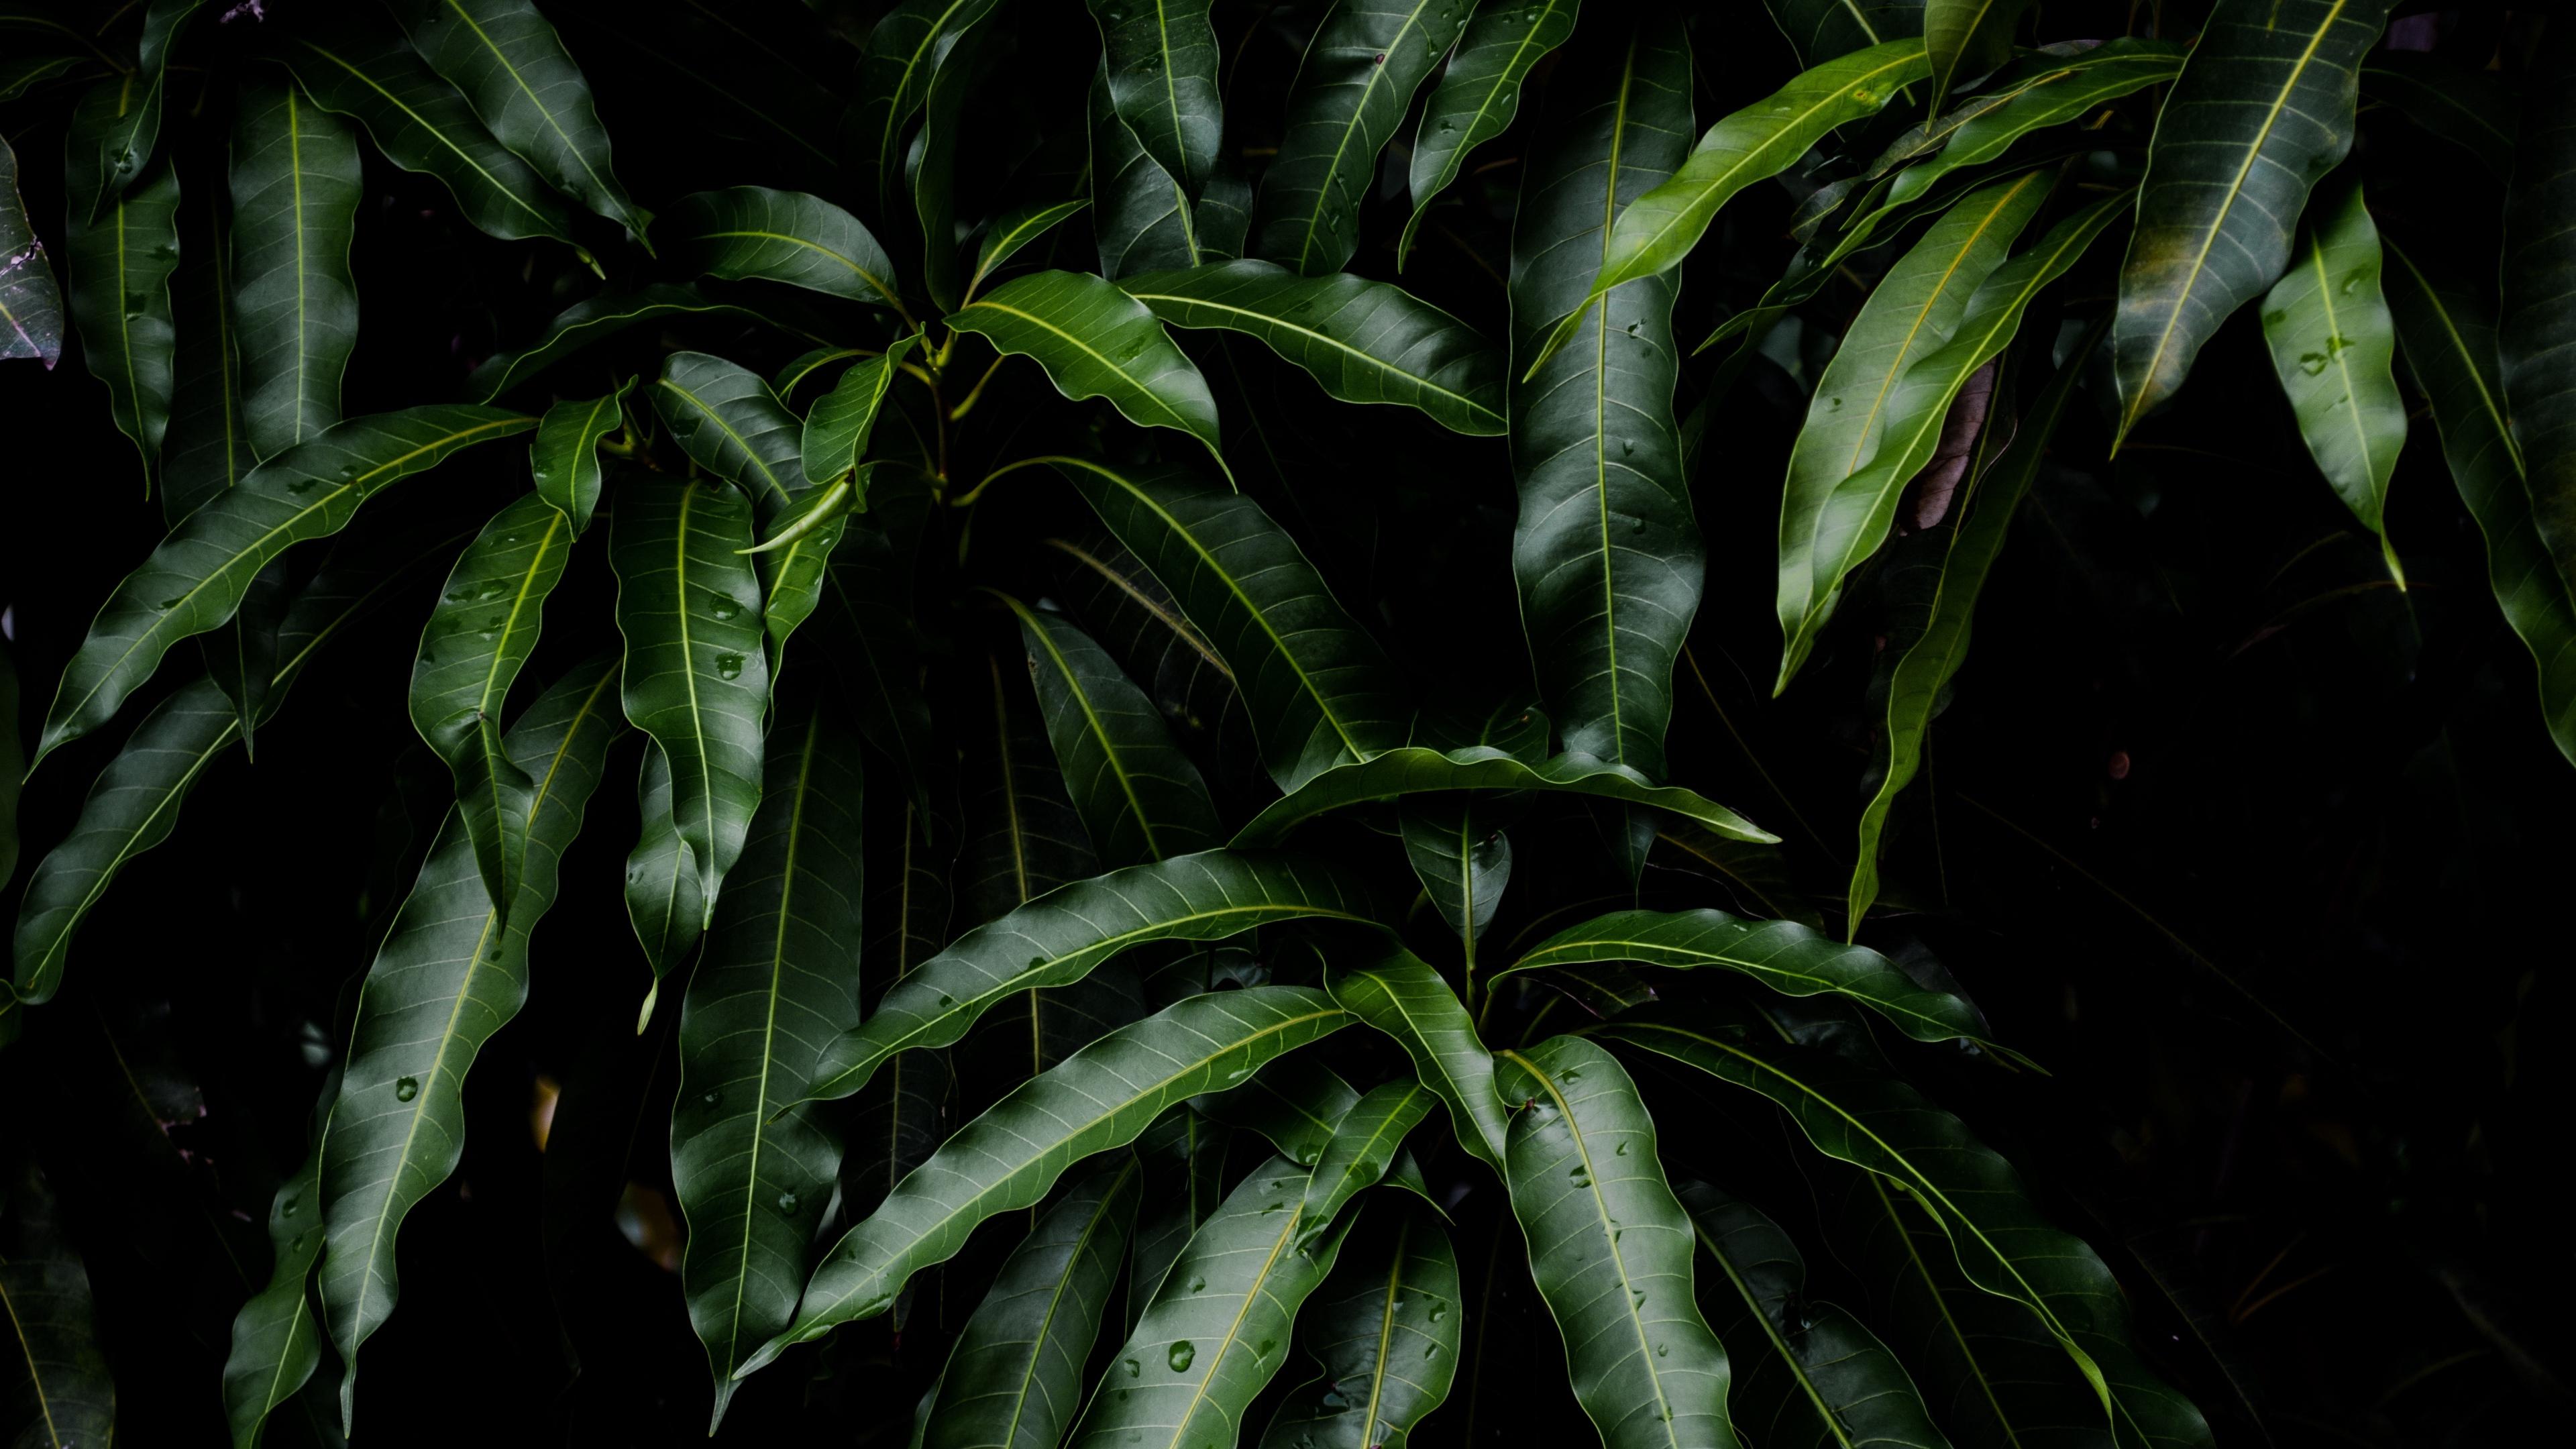 leaves green plant mango 4k 1541113461 - leaves, green, plant, mango 4k - Plant, Leaves, green